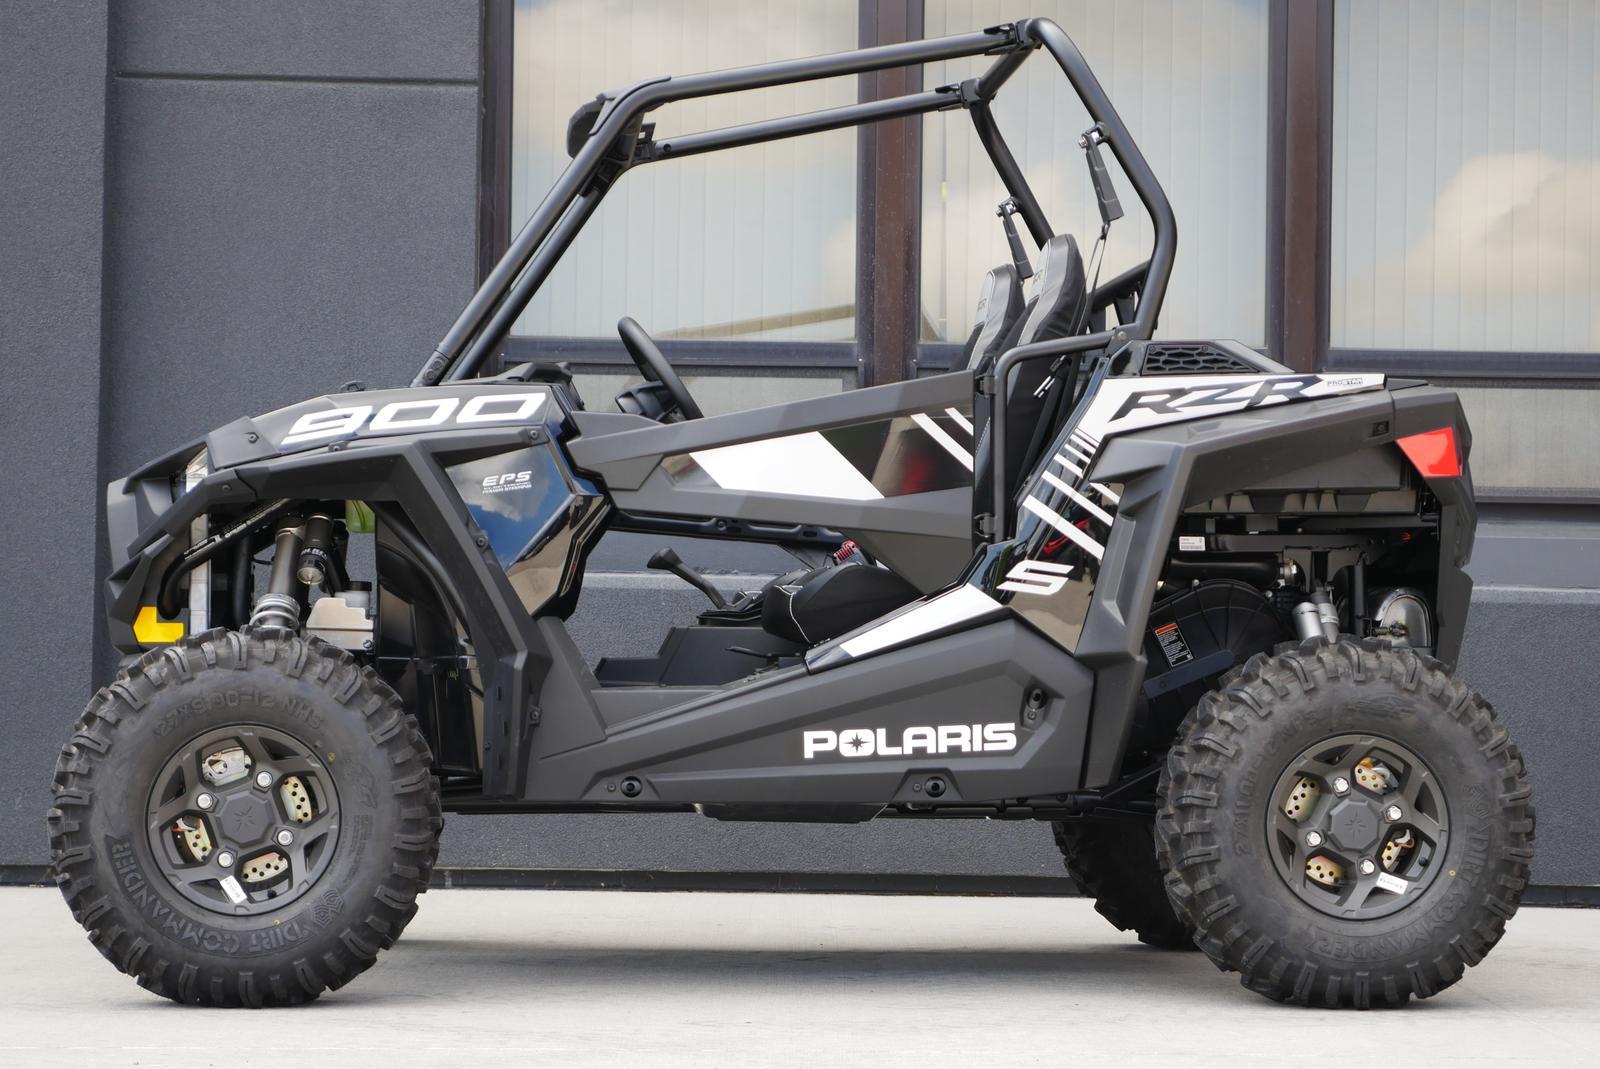 2019 Polaris Industries RZR 900 S